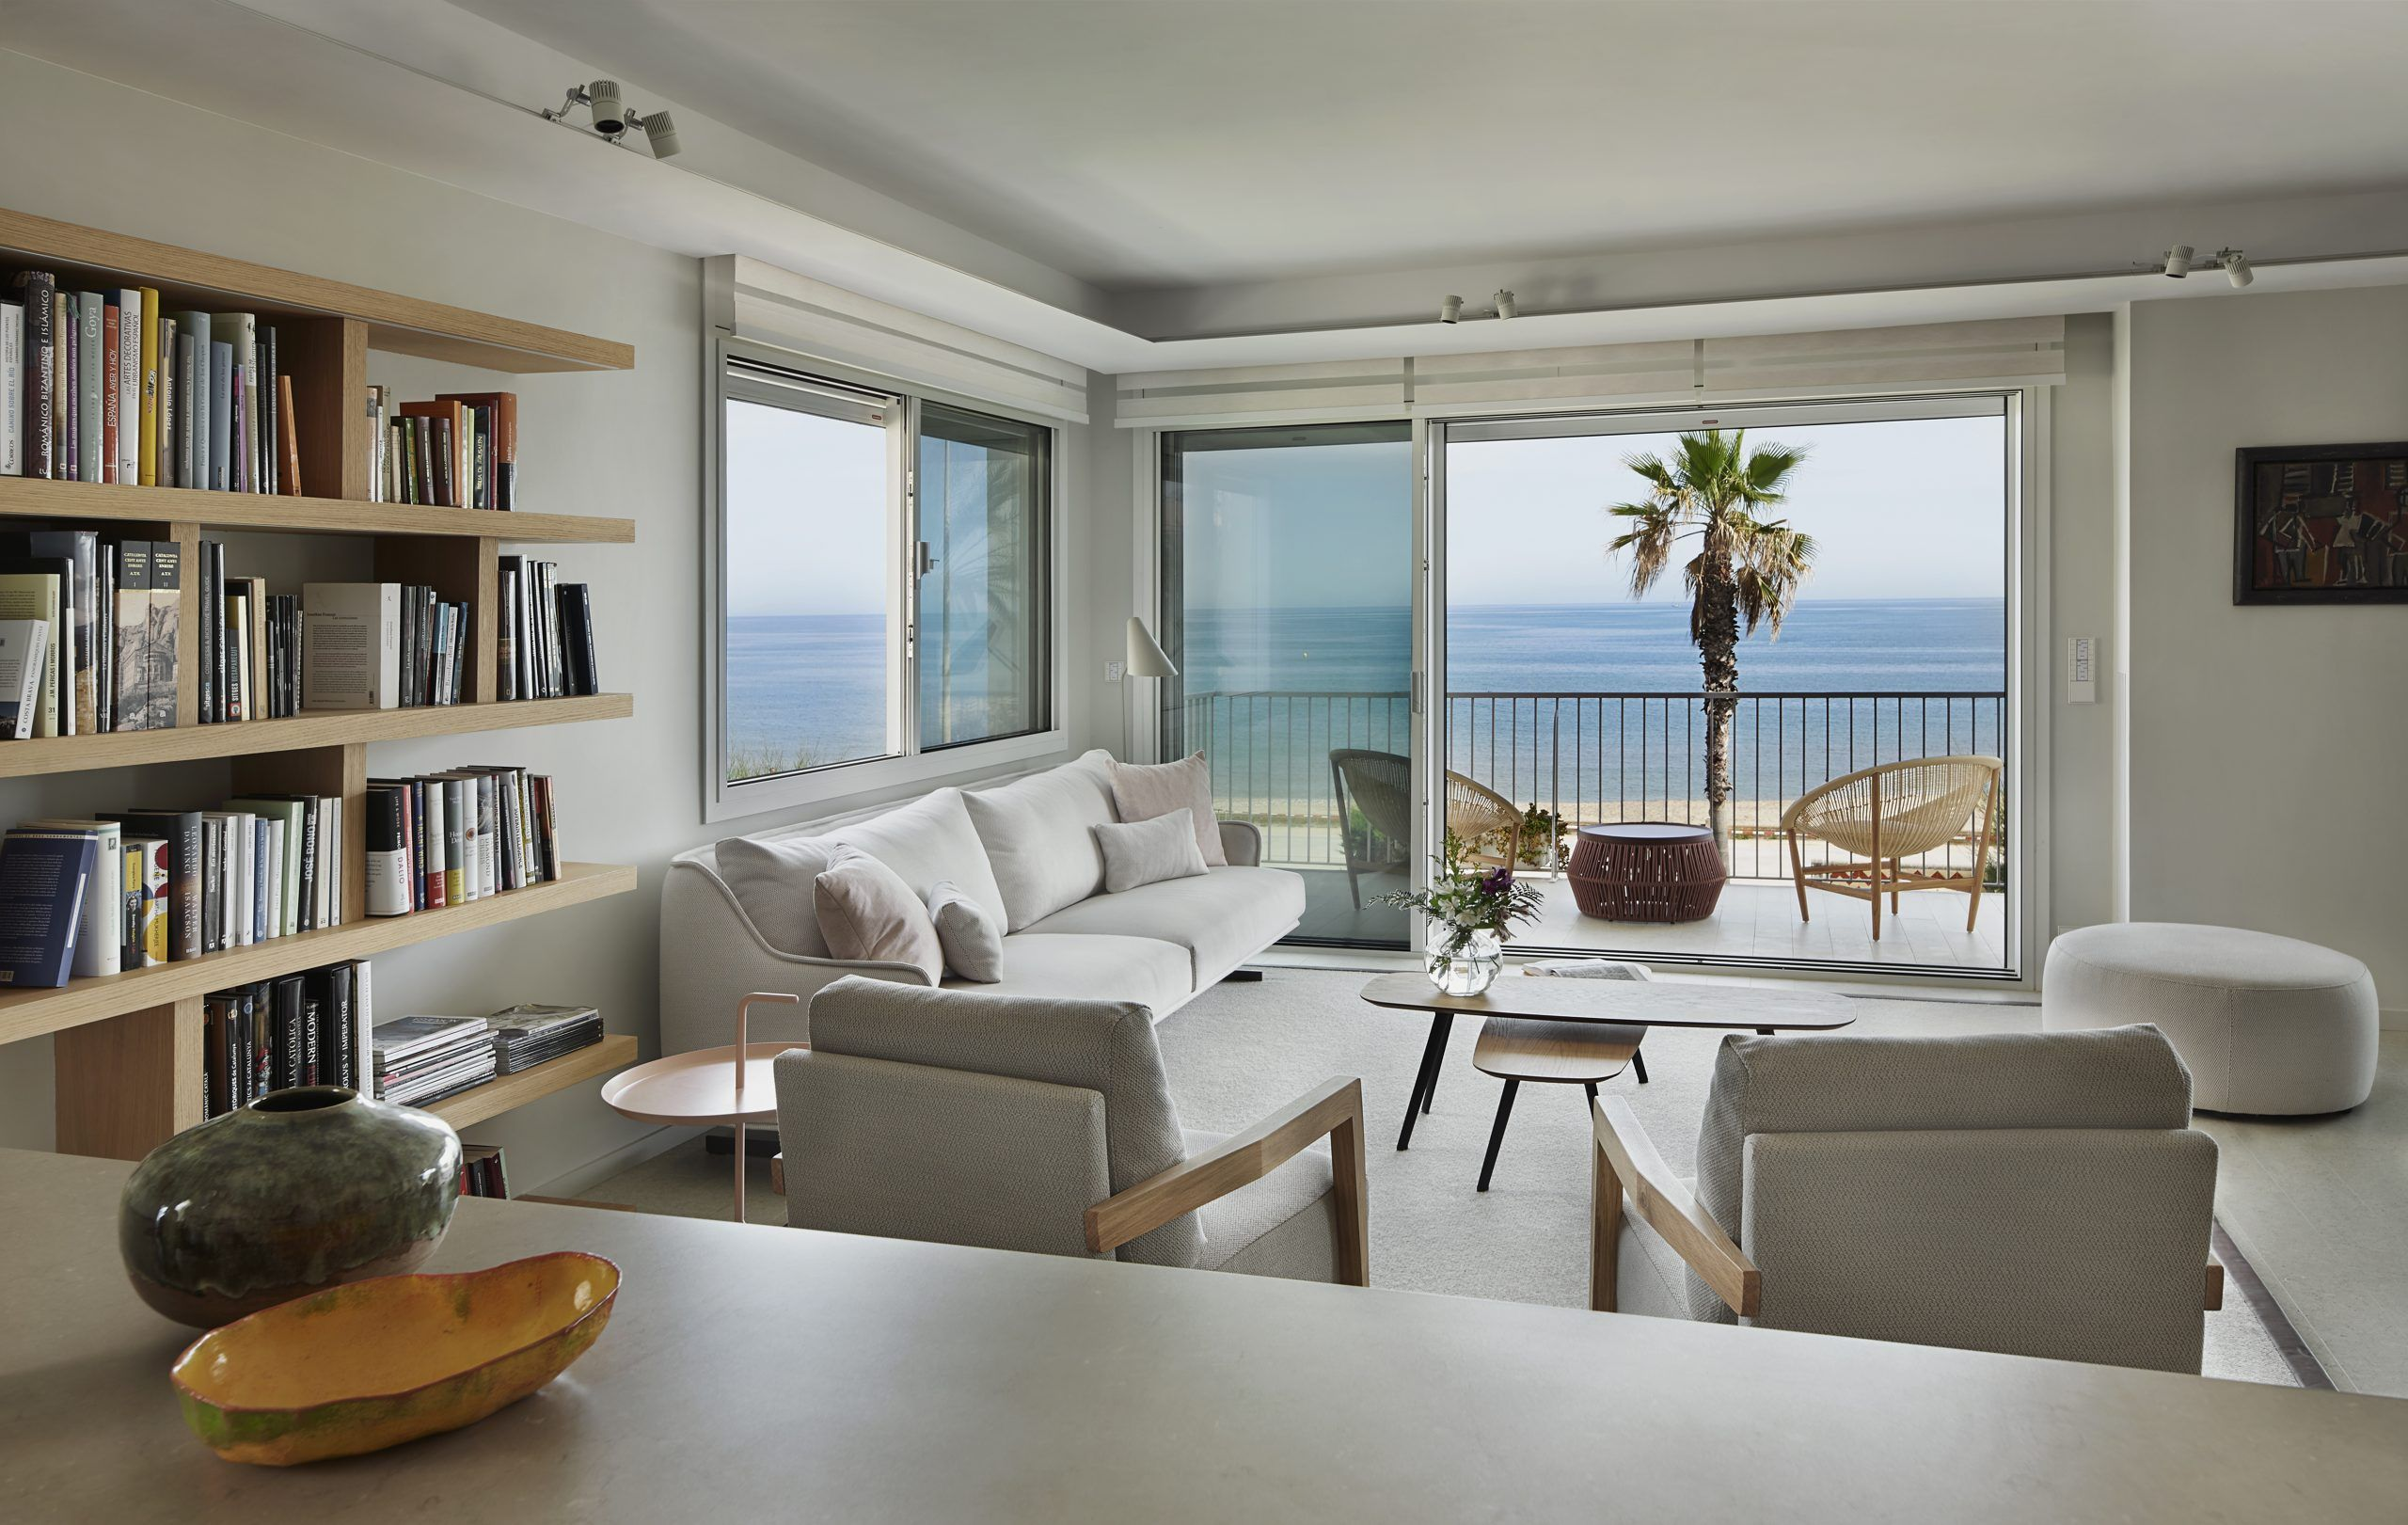 Full refurbishment of a sea view aparment - RARDO-Architects